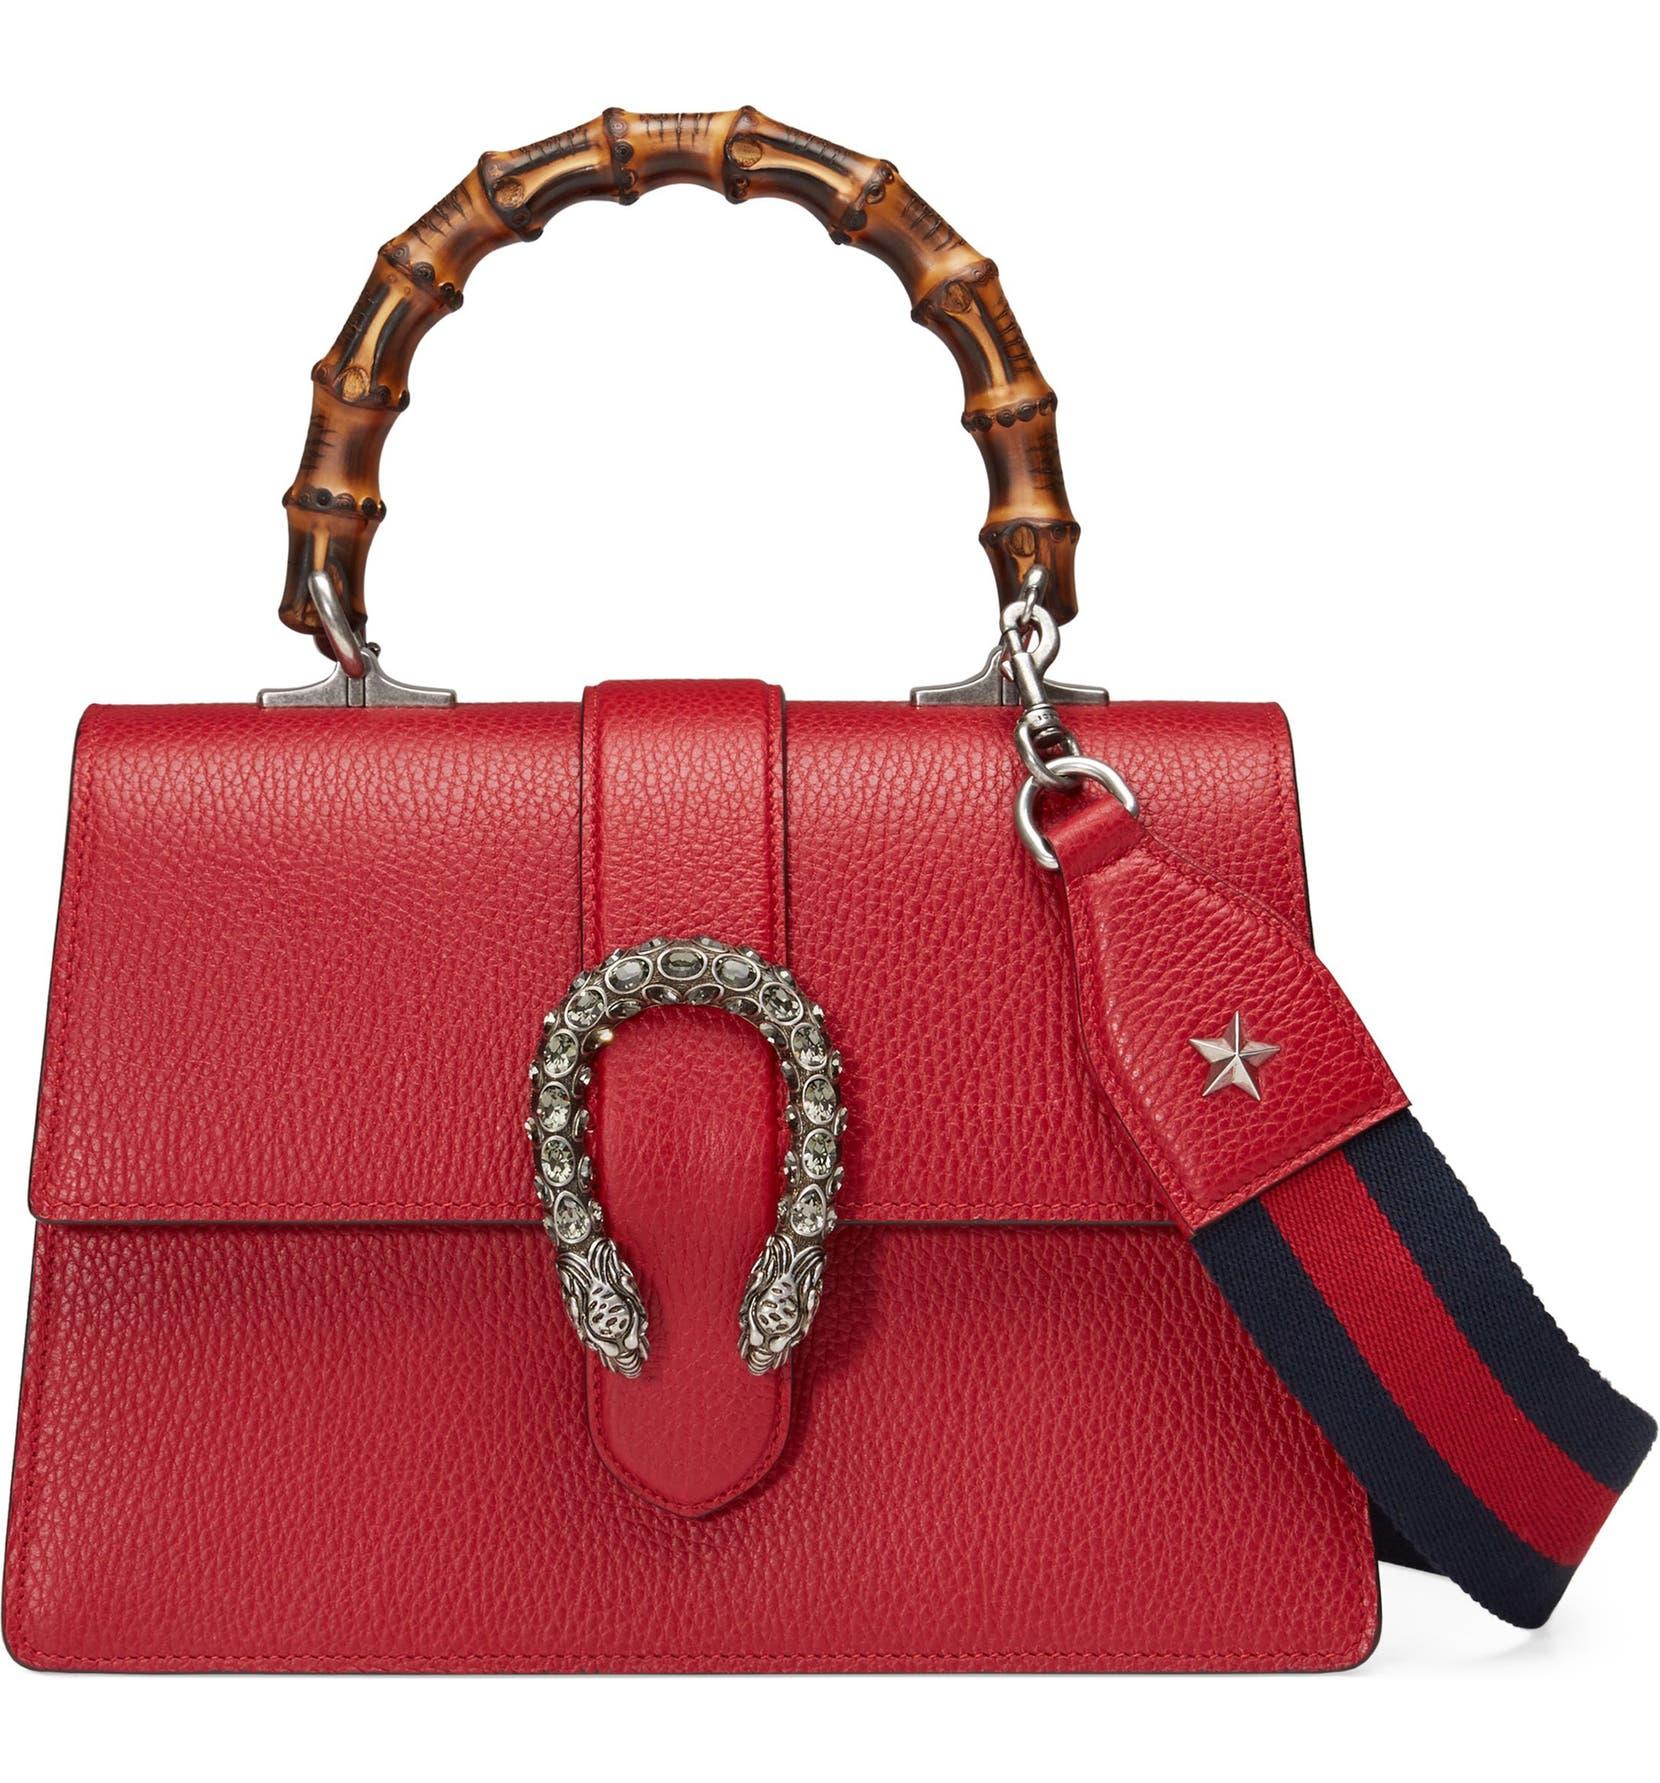 850893bd1 Gucci Medium Dionysus Leather Top Handle Satchel | Nordstrom